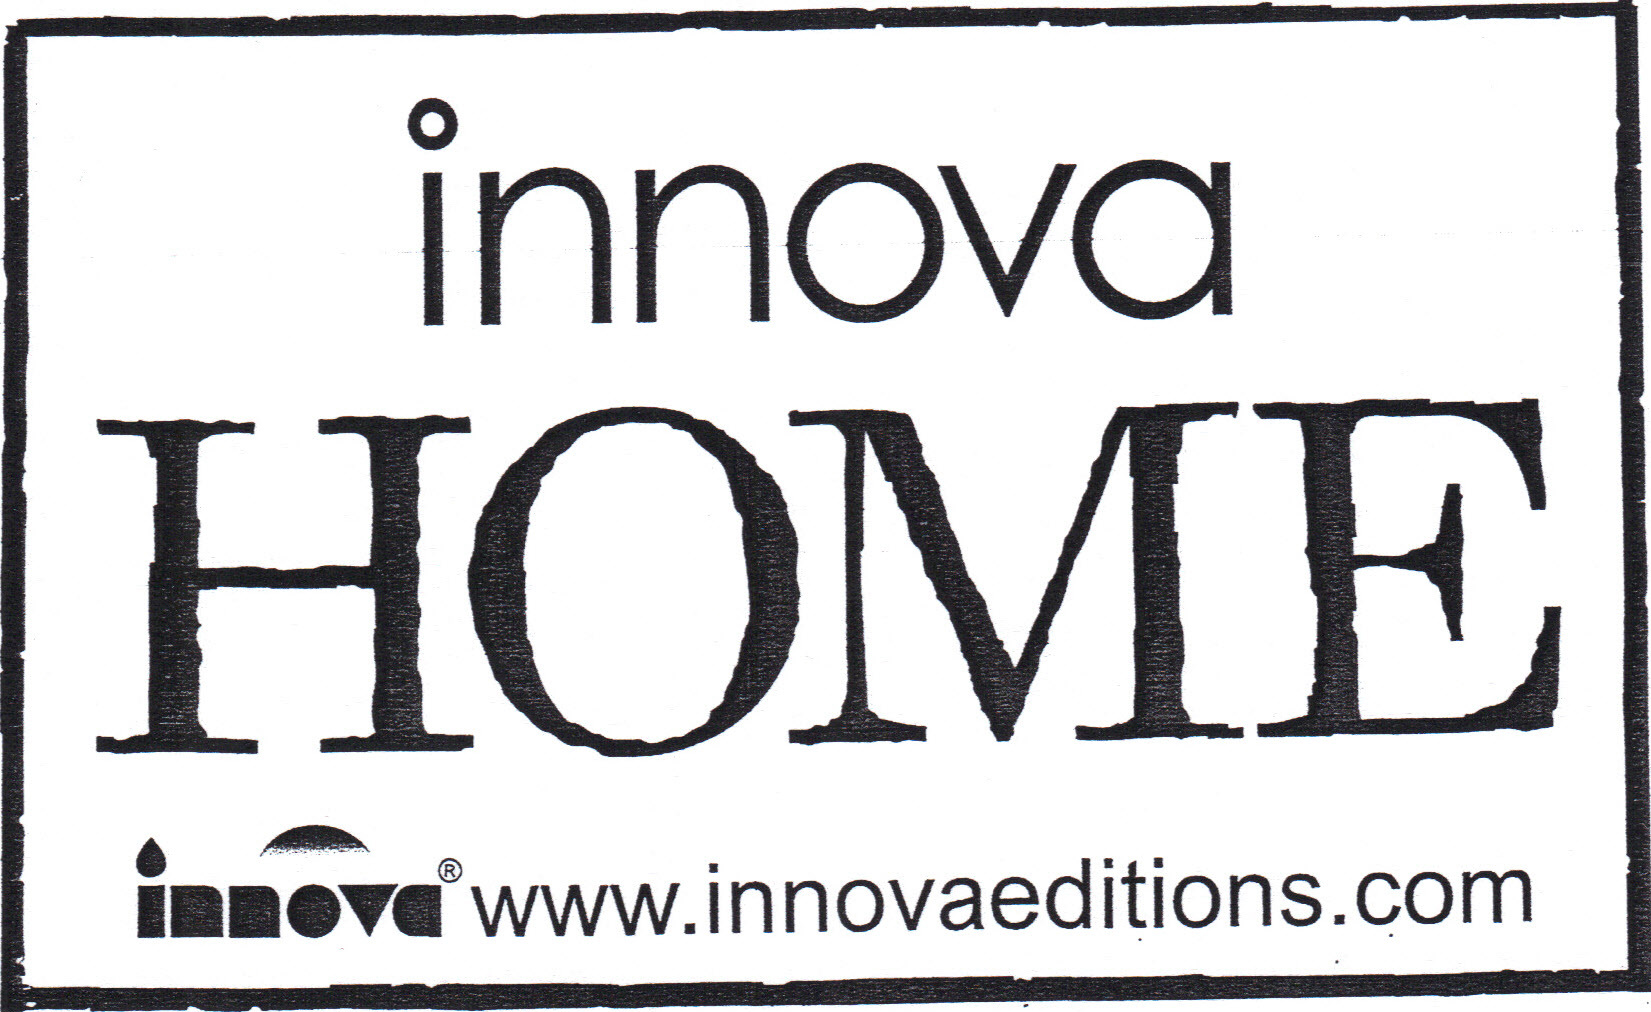 Innova Home innova home innova innovaeditions com reviews brand